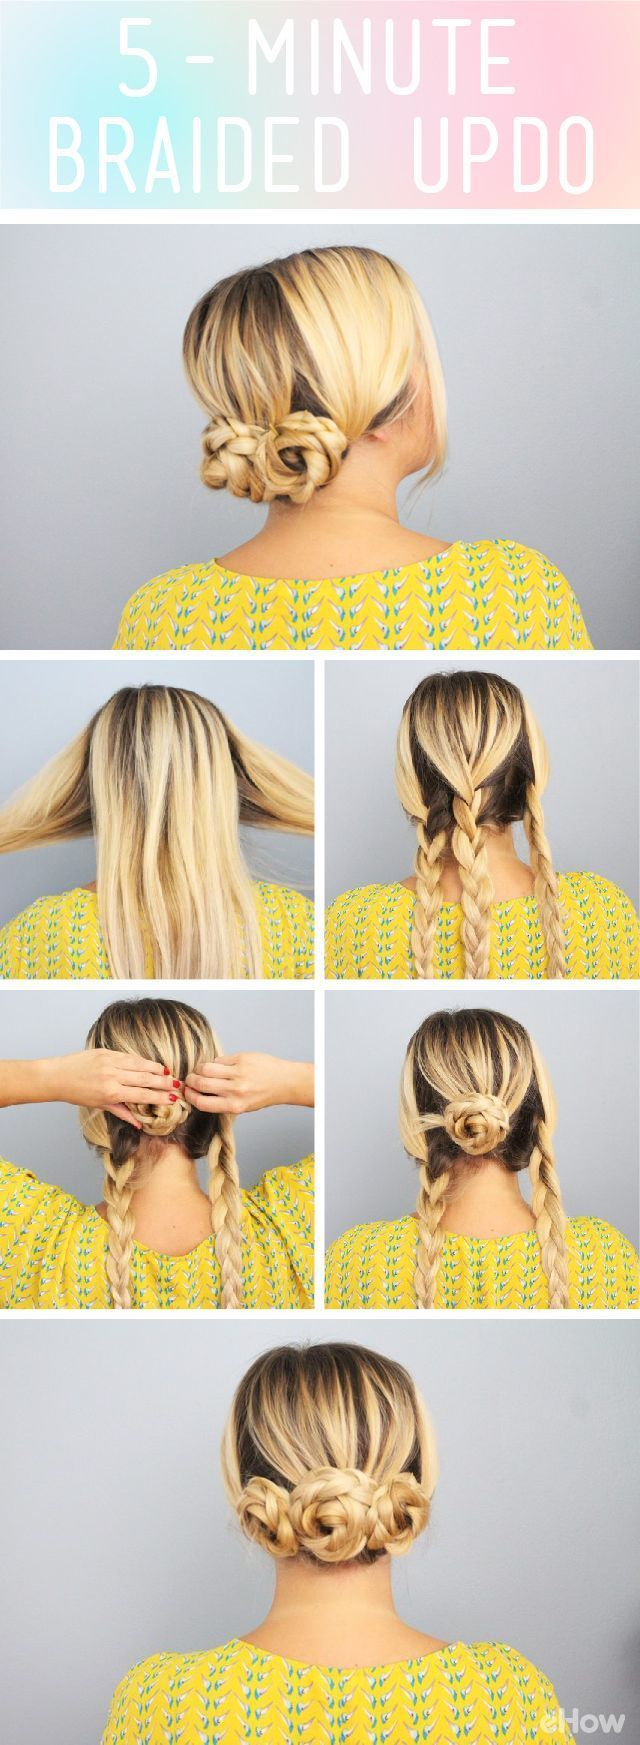 Best 10+ Easy work hairstyles ideas on Pinterest | Work hairstyles, Simple  hair updos and Easy updo - Best 10+ Easy Work Hairstyles Ideas On Pinterest Work Hairstyles